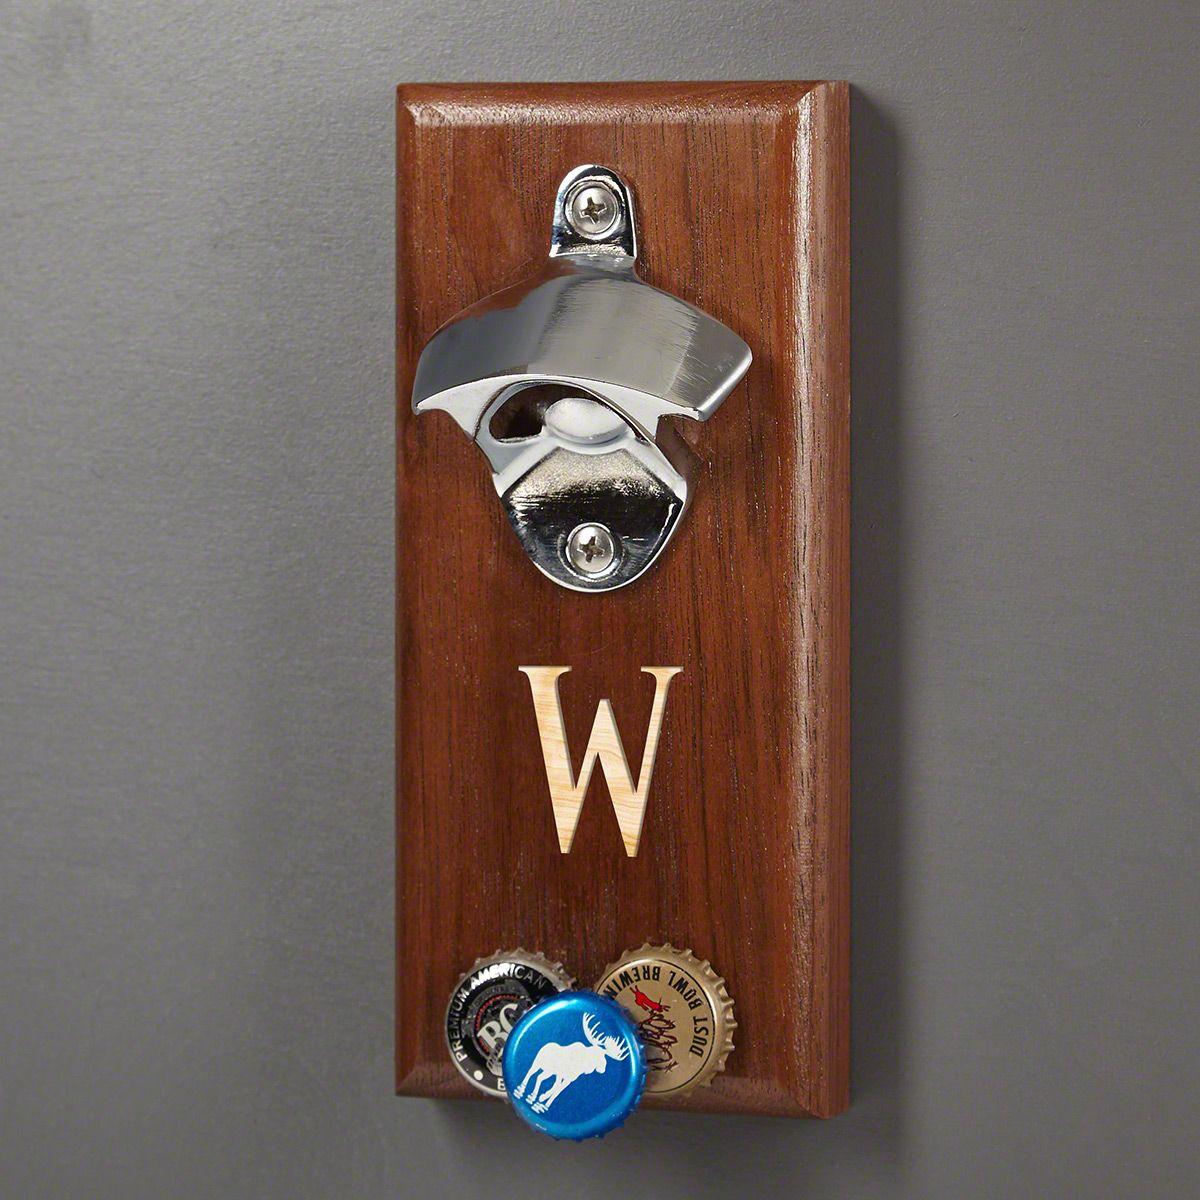 Baxter Magnetic Bottle Opener with Cap Catcher (Engravable)